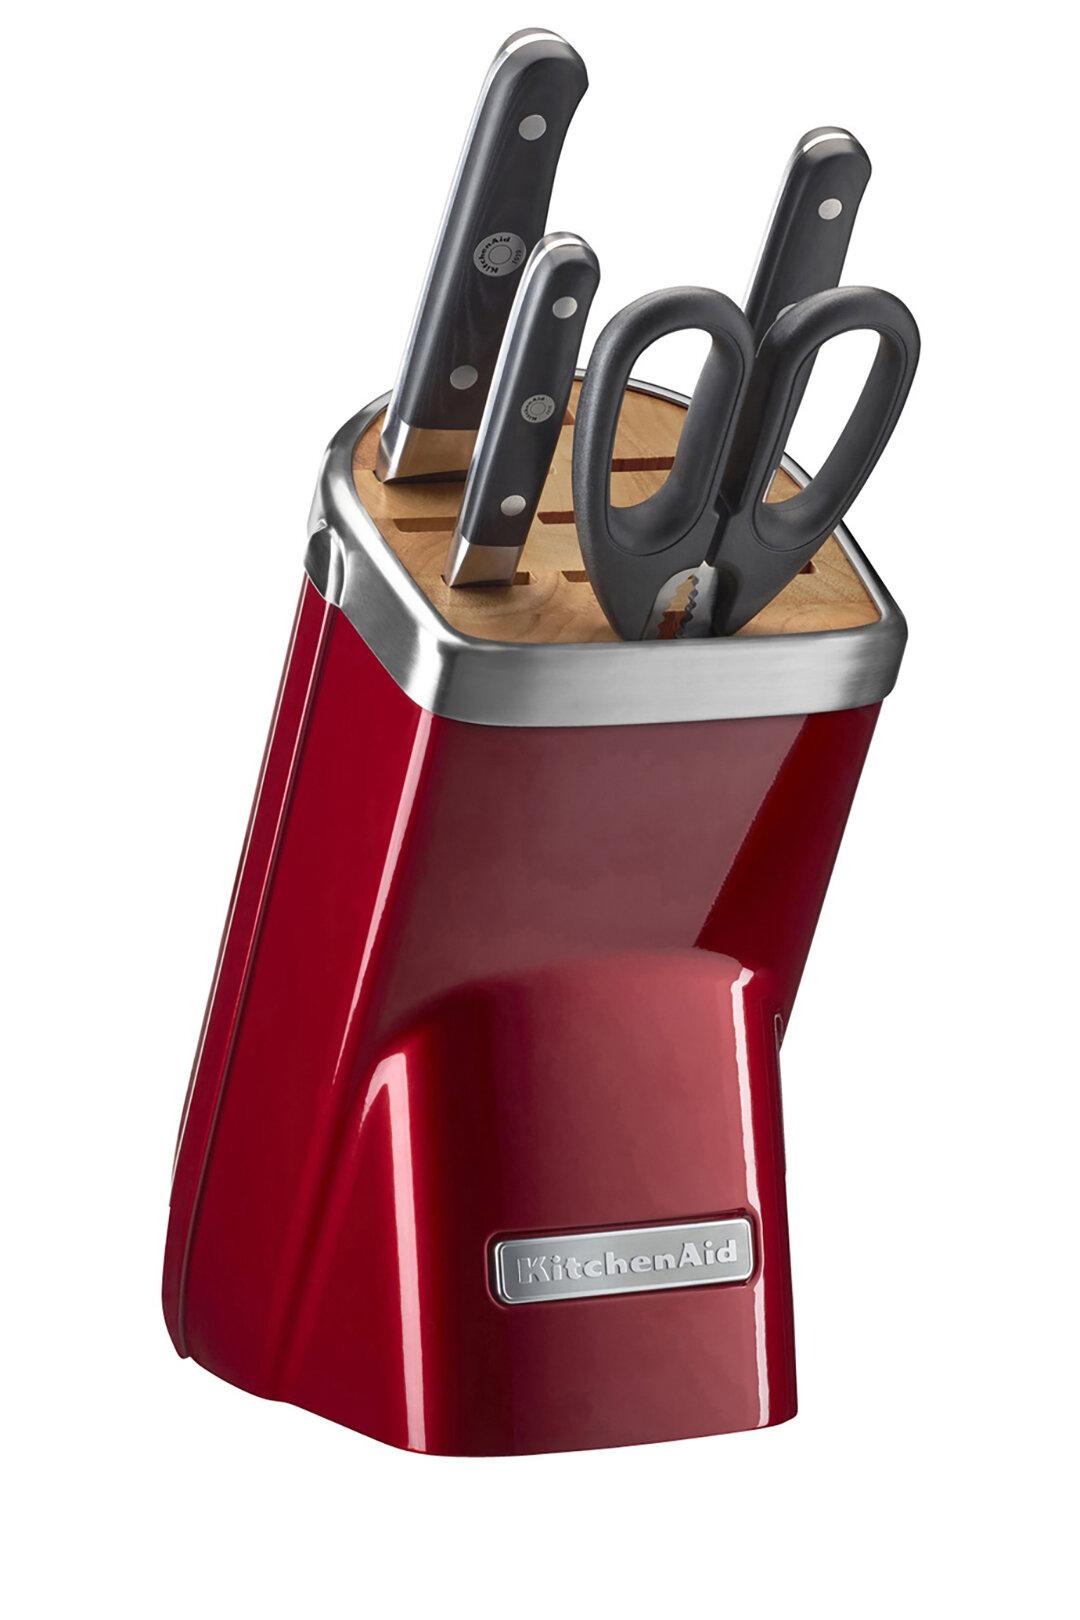 Kitchenaid 5 Piece Professional Series Knife Block Set Perigold